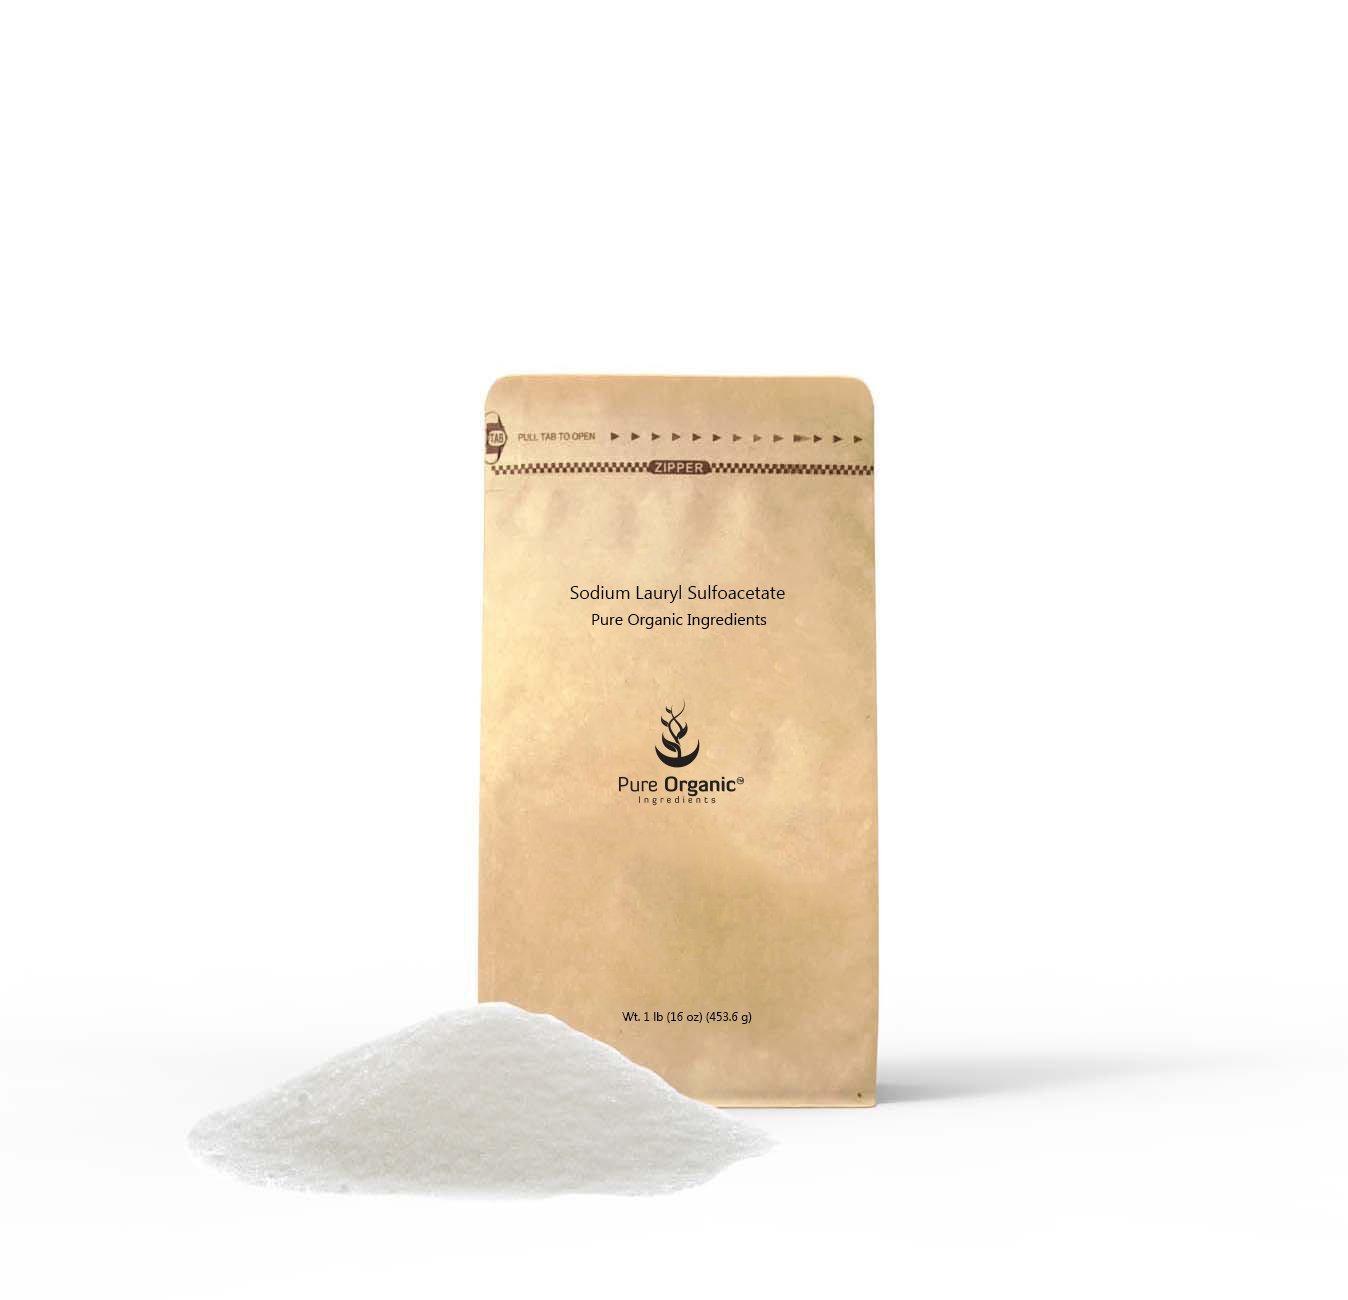 Sodium Lauryl Sulfoacetate (1 lb (16 oz)(Multiple Sizes)(Bath Bomb additive)(Gentle on Skin)